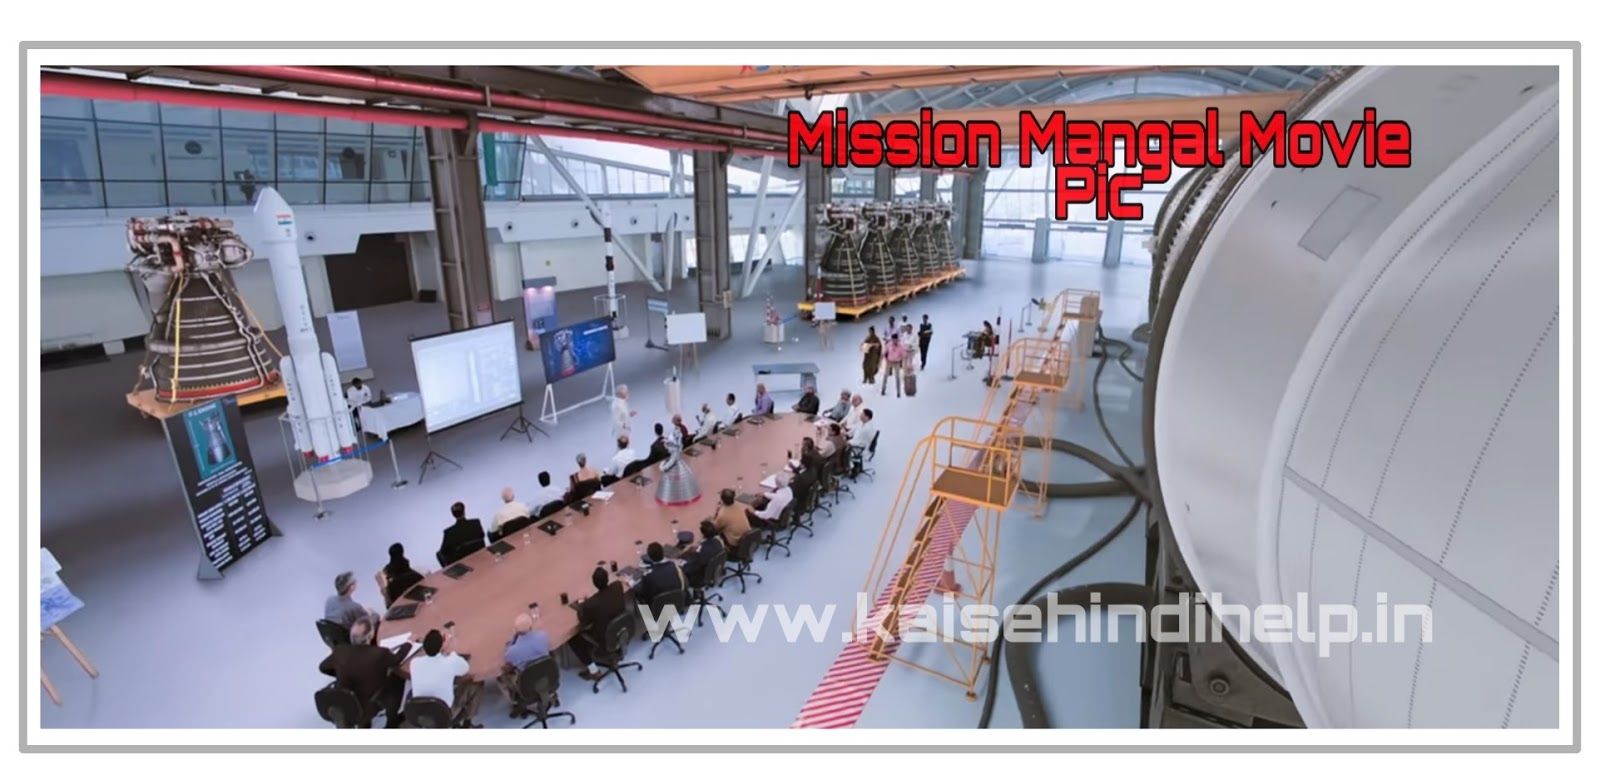 How To Downlaod Mission Mangal movie Full HD